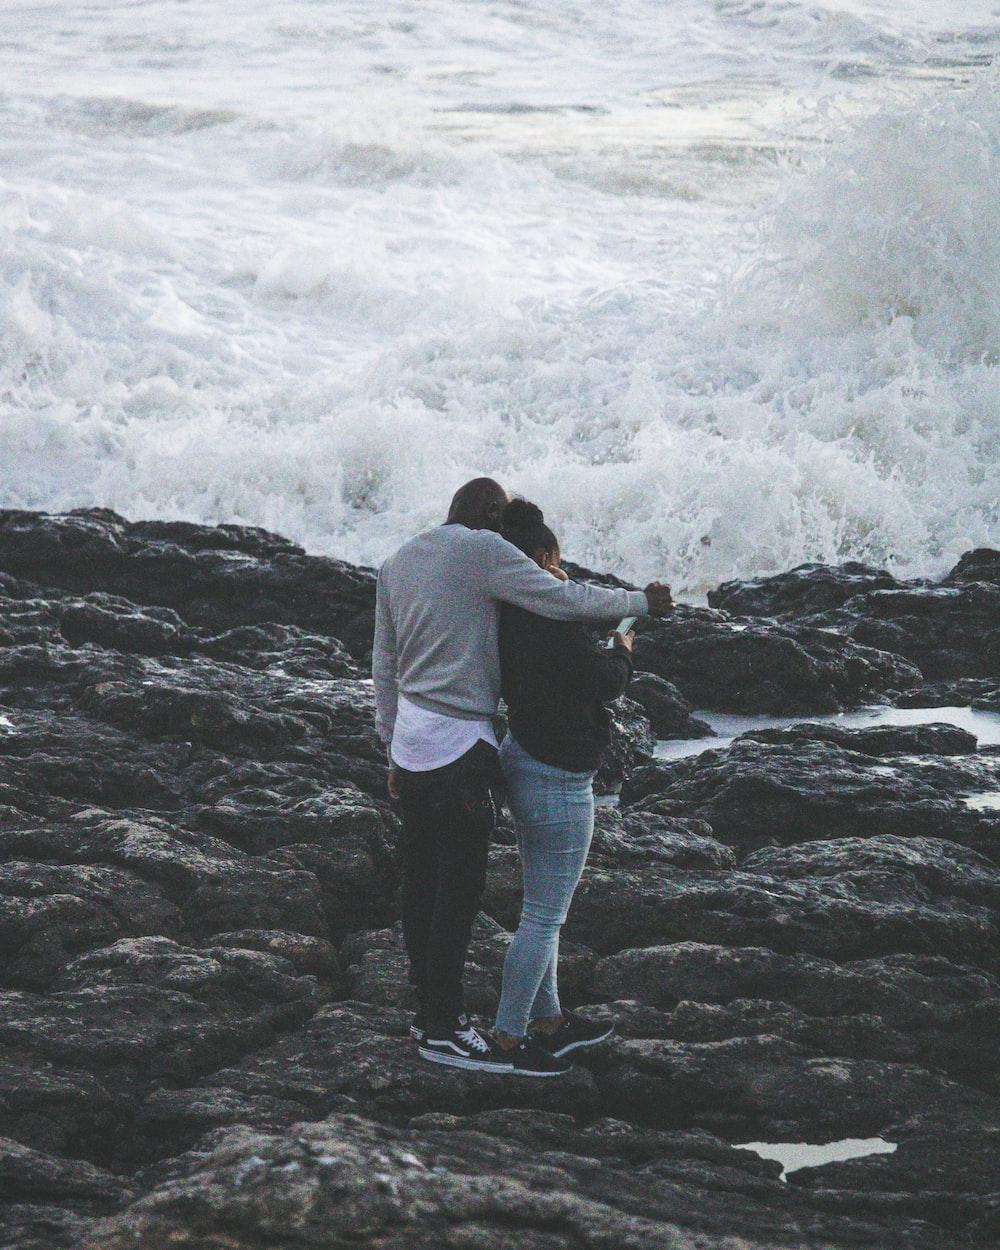 man and woman on rock near beach talking photo